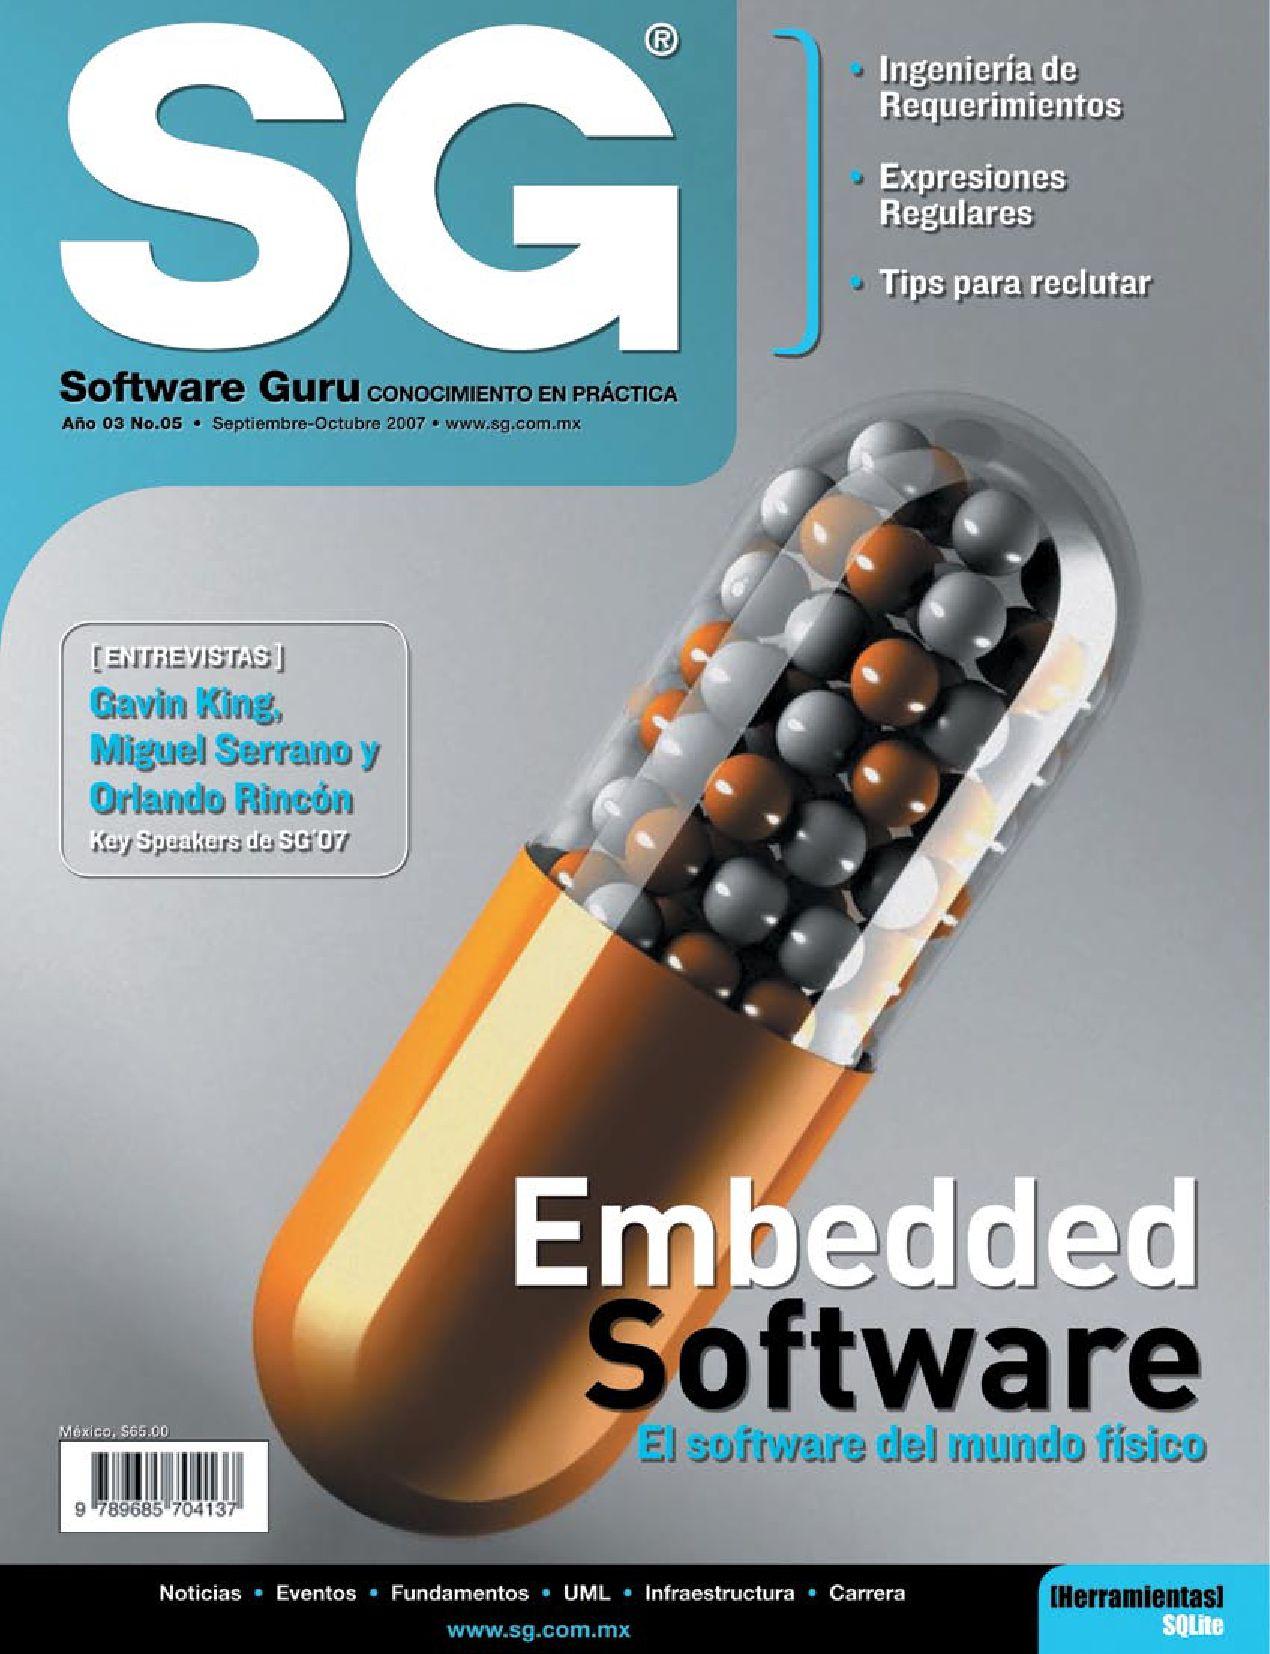 SG17 (Septiembre-Octubre 2007) by Revista Software Guru - issuu